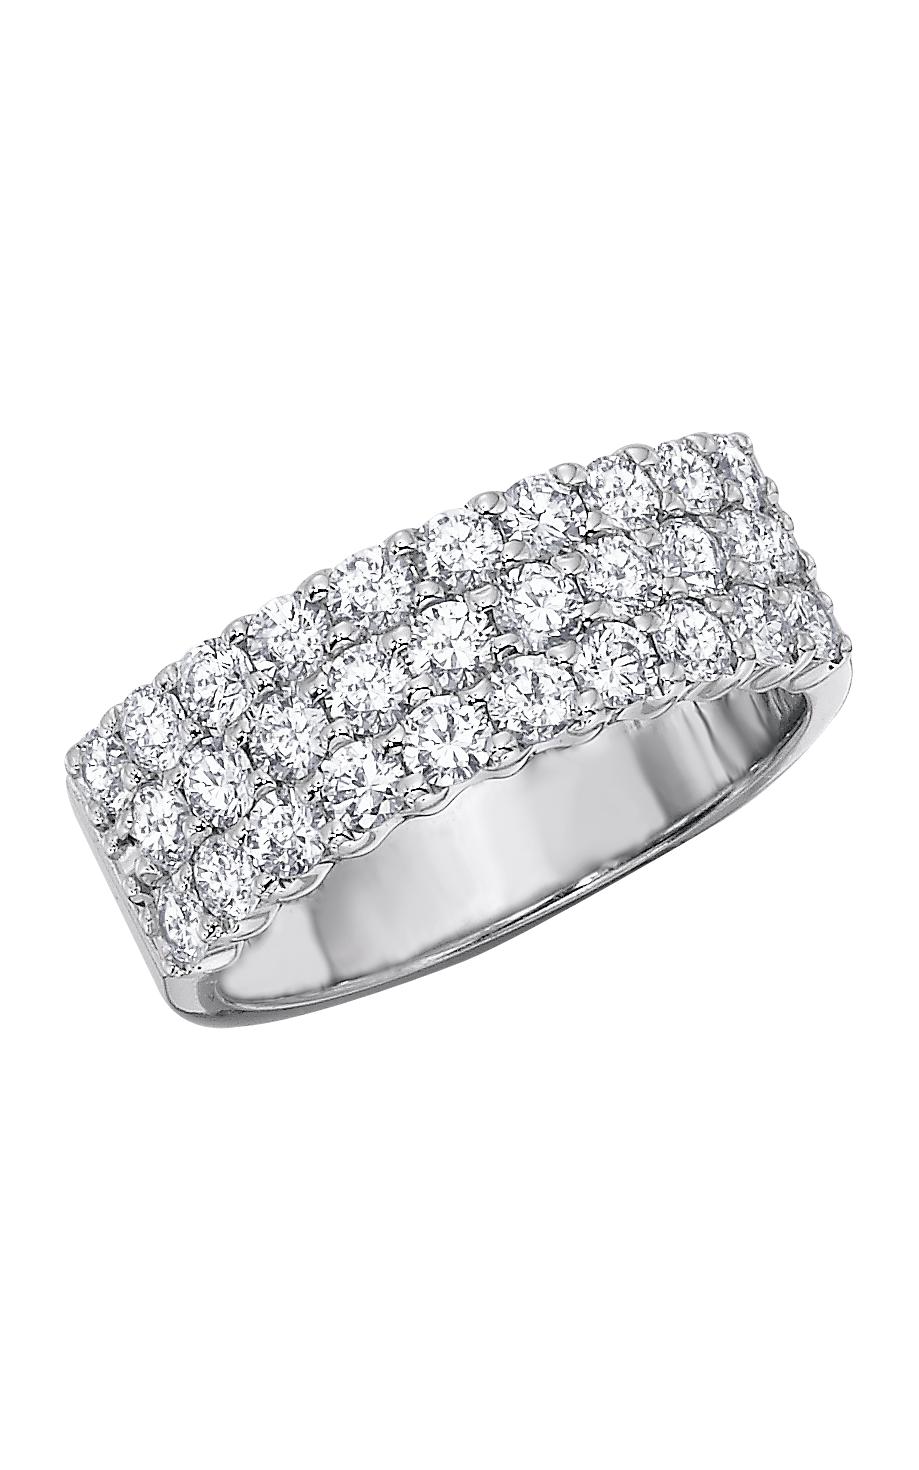 Beny Sofer Wedding Bands BSR1506B product image